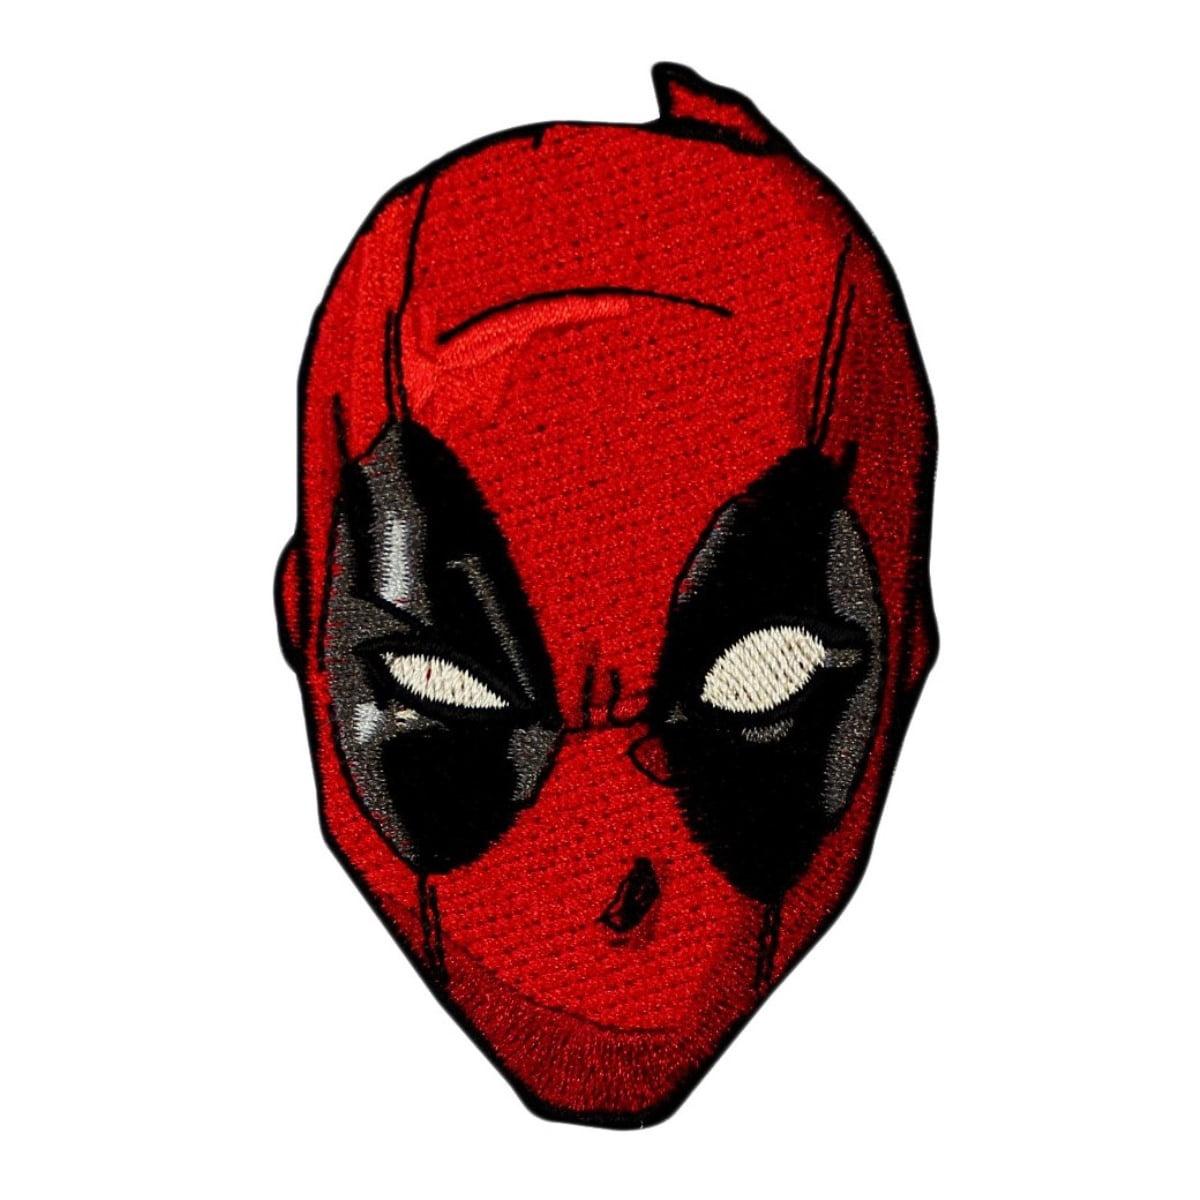 Deadpool Face Mask Iron-On Patch Marvel Comic Anti-Hero Craft Apparel Applique